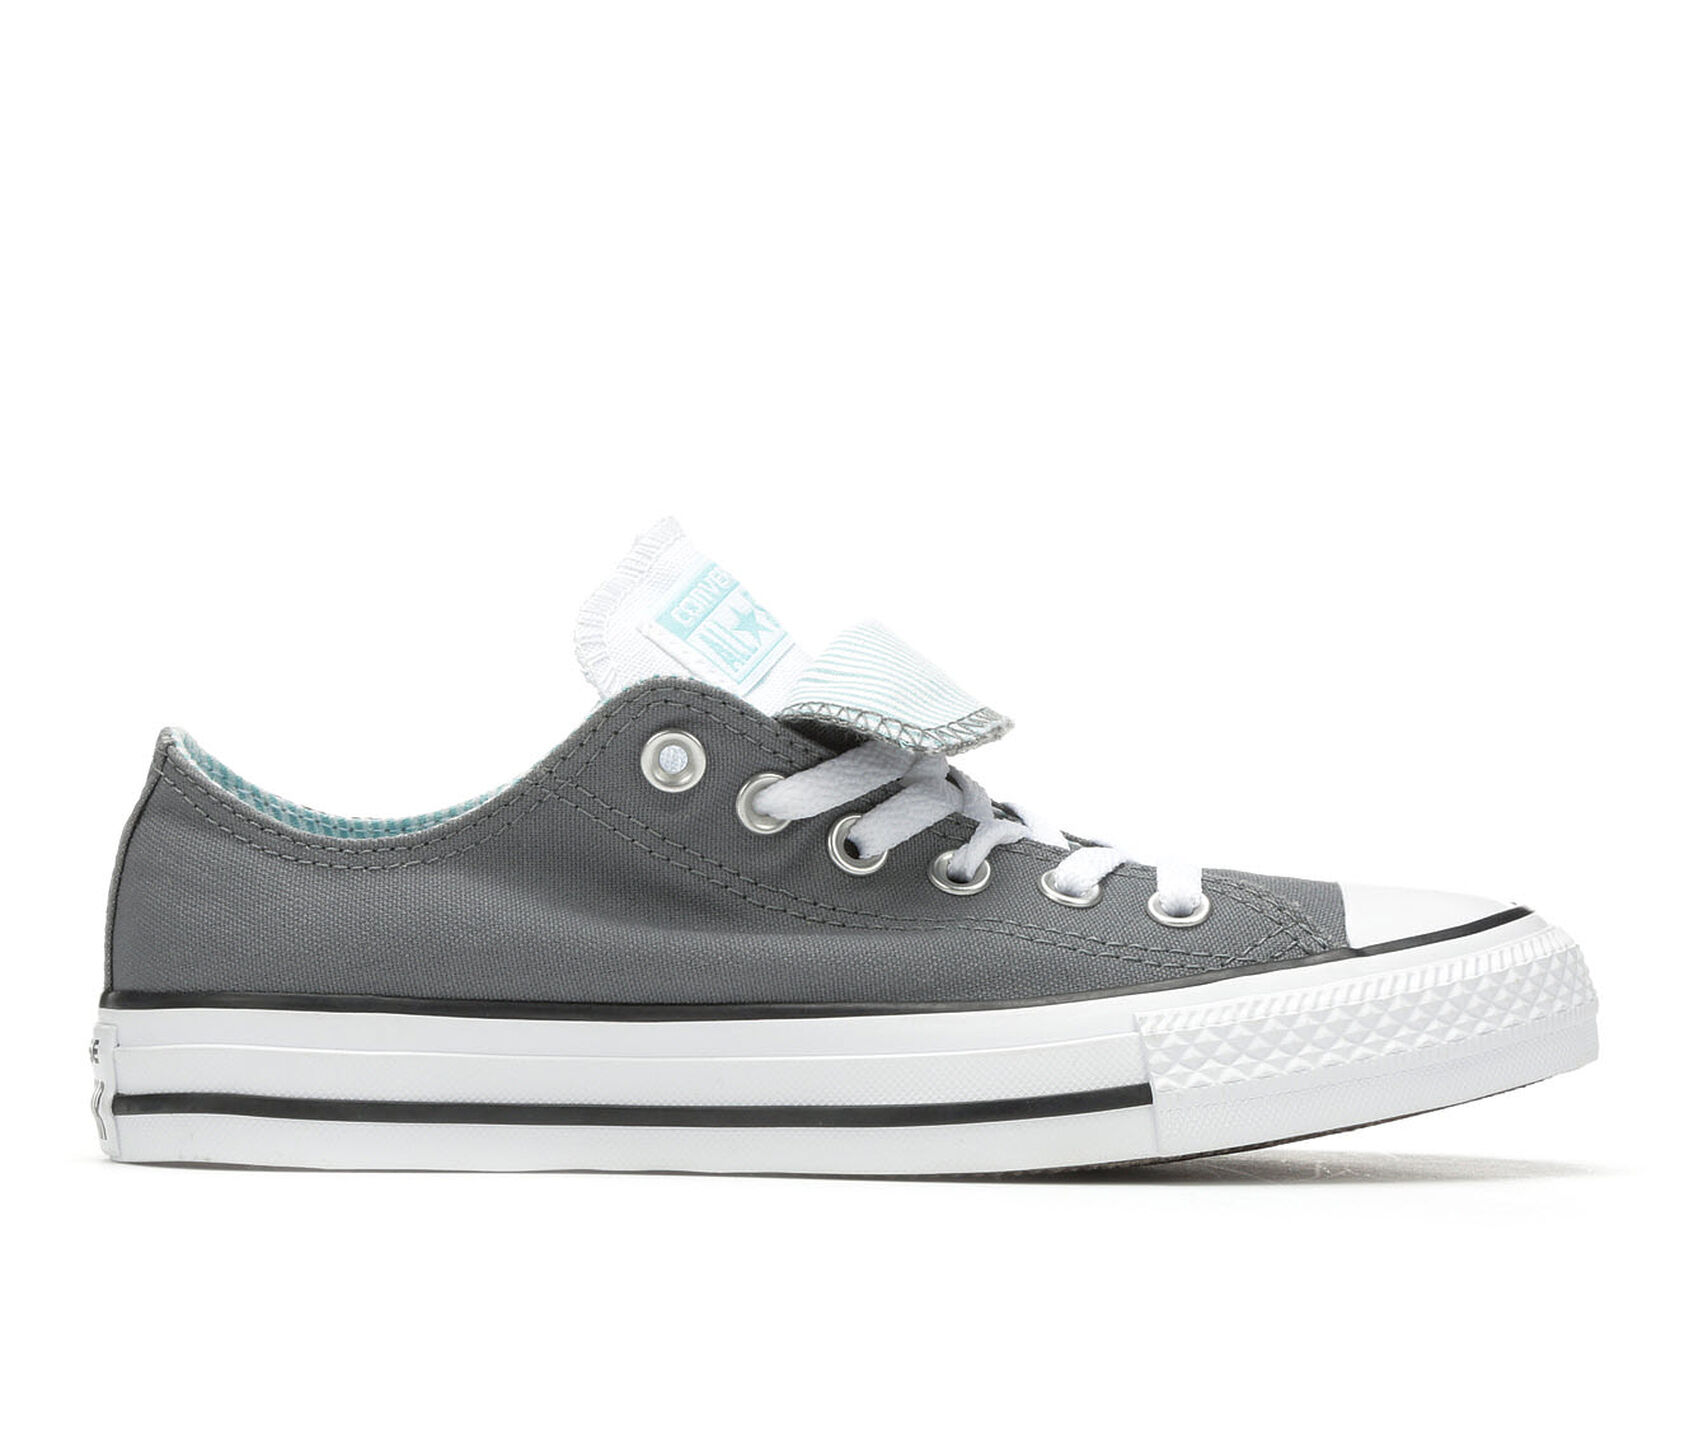 e75a9fc84c8 Women s Converse Chuck Taylor Double Tongue Stripe Sneakers